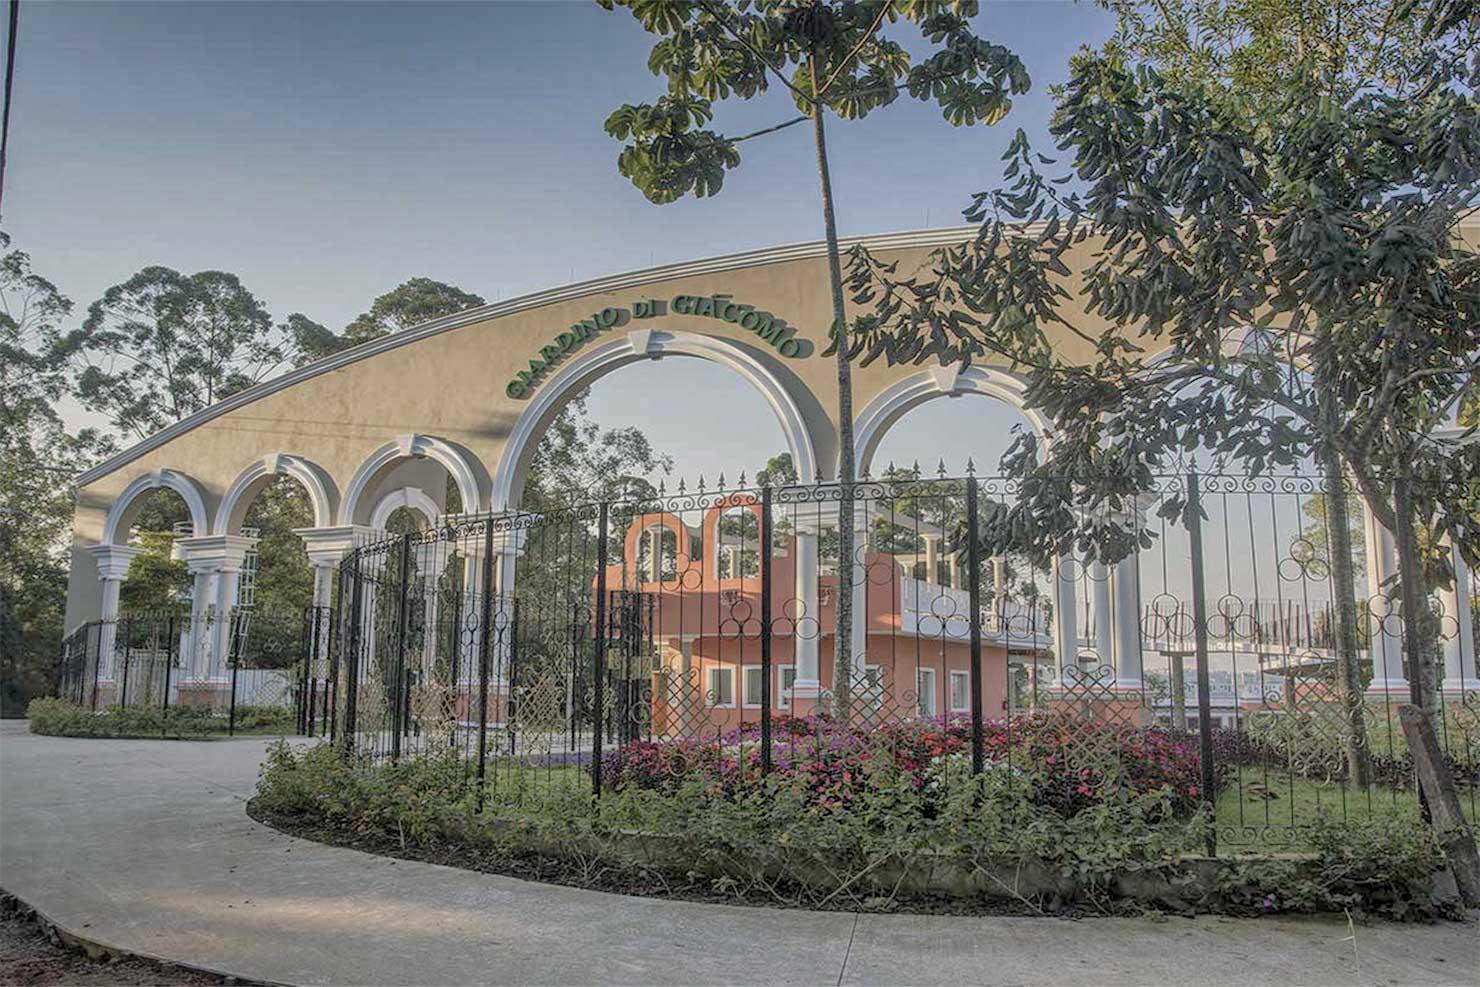 hdr-flavio-machado-arquitetura-1-home3-Comercial-Parque-Giardino-di-Giacomo